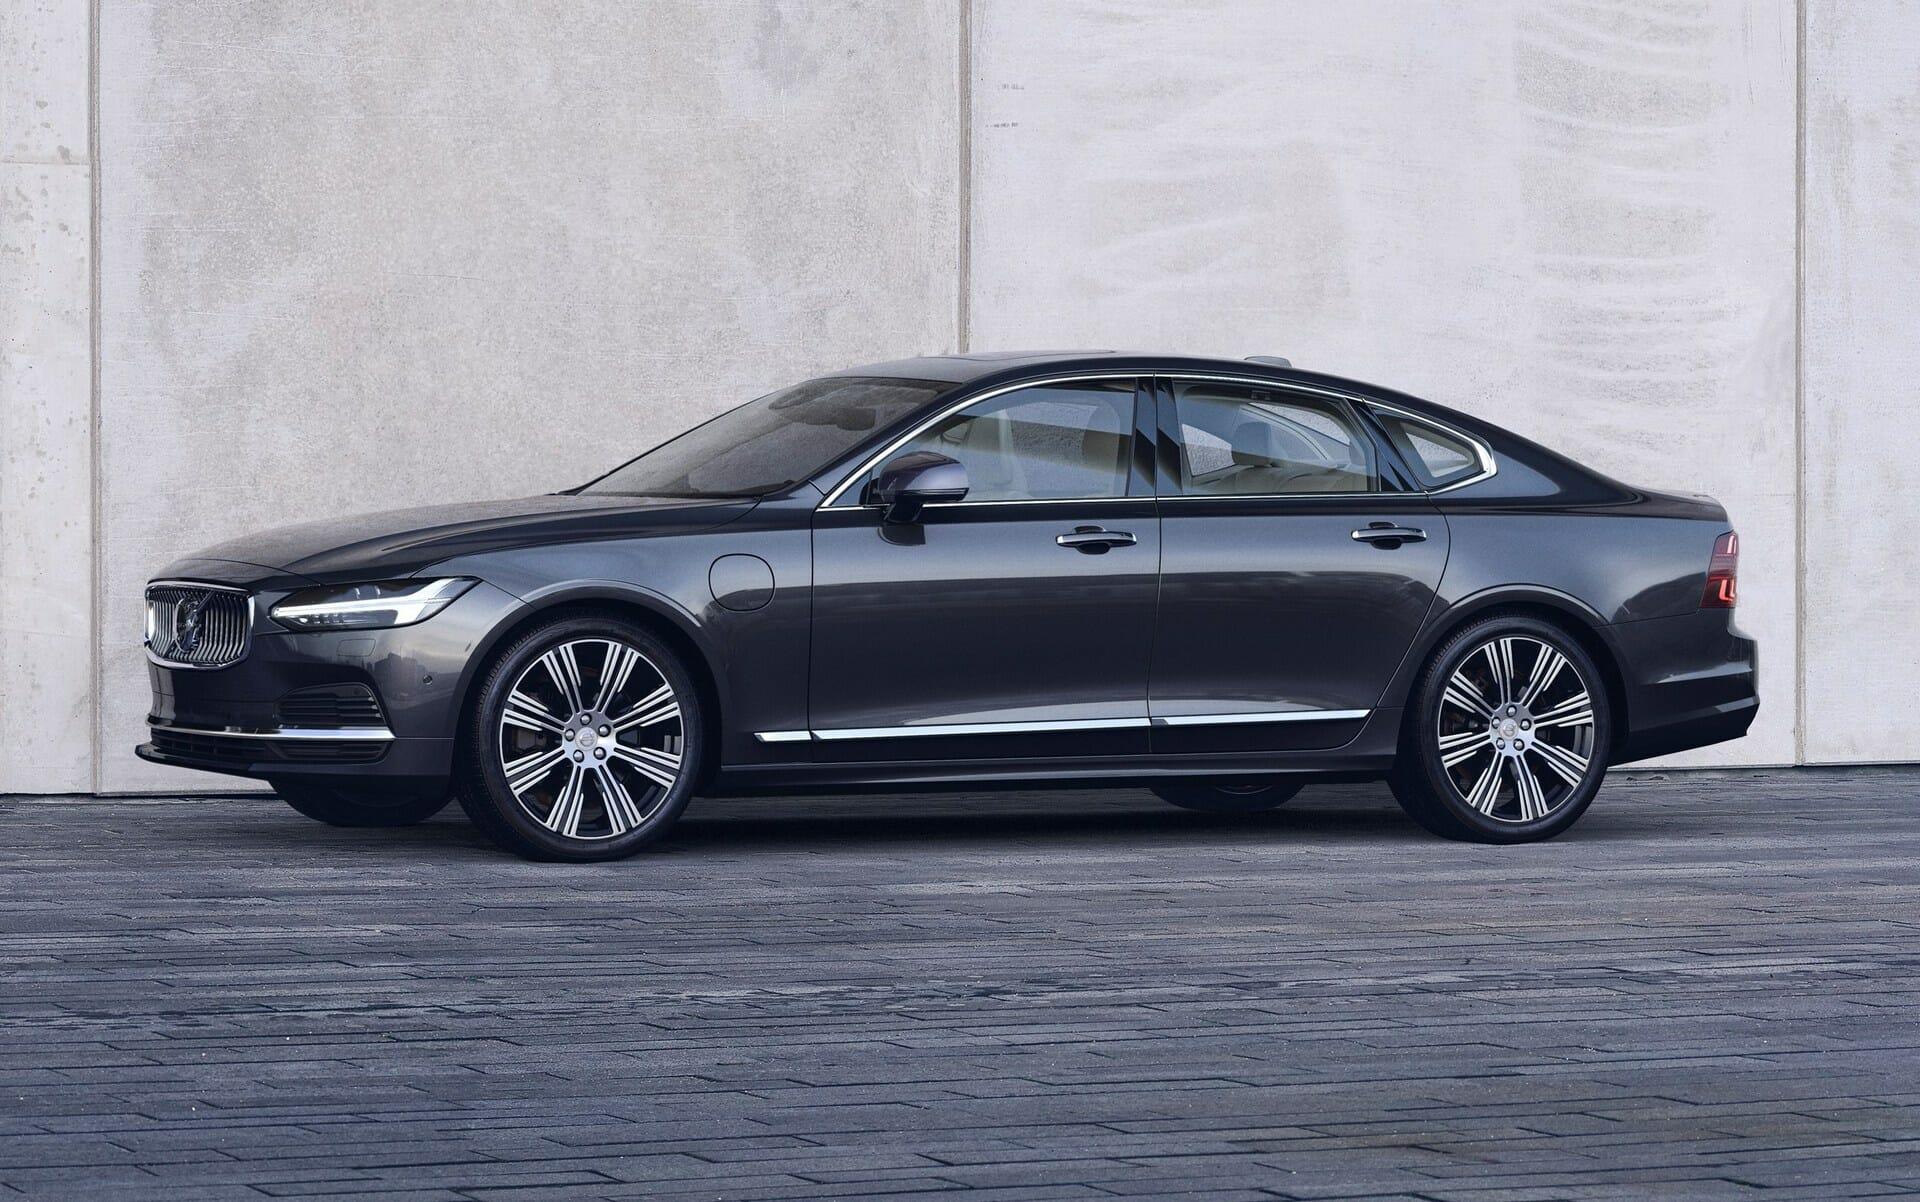 Volvo: Ανανέωση και υβριδικοί κινητήρες για τα S90 και V90